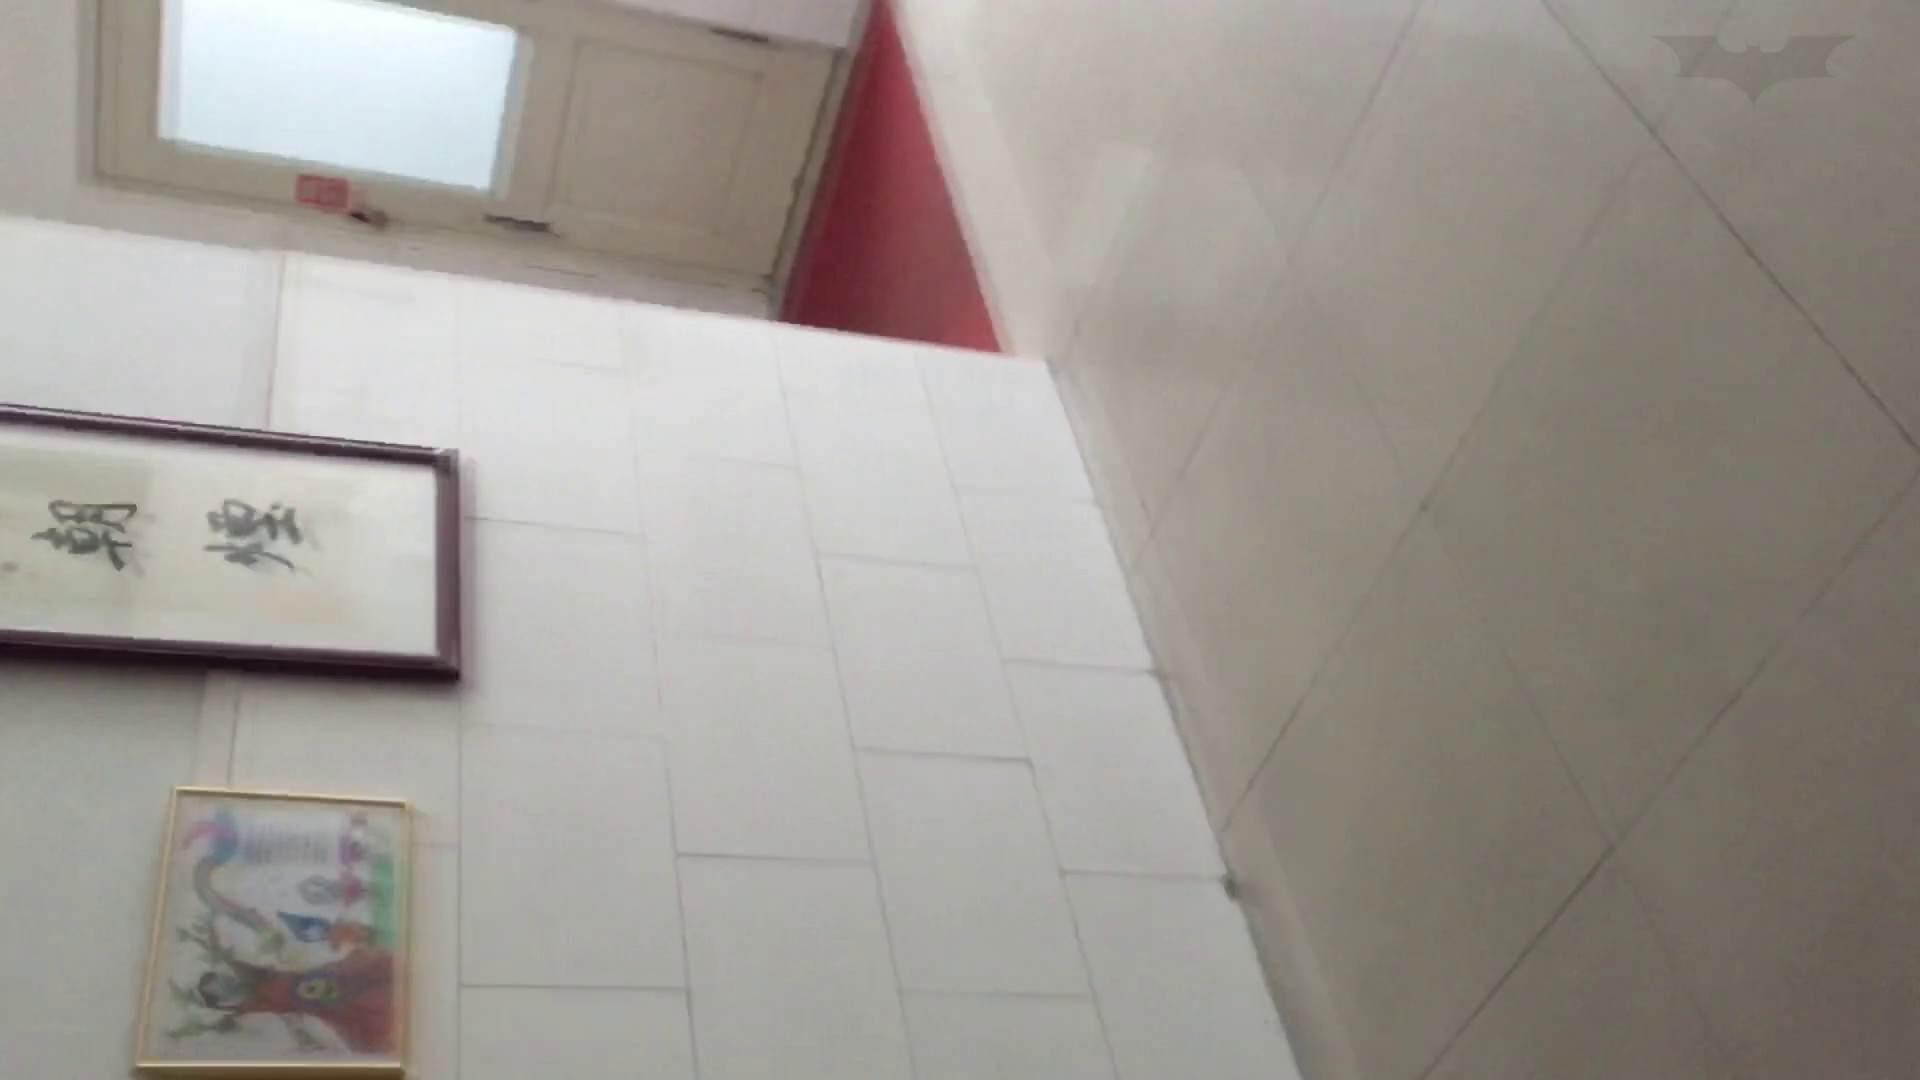 芸術大学ガチ潜入盗撮 JD盗撮 美女の洗面所の秘密 Vol.80 盛合せ AV無料 53画像 4